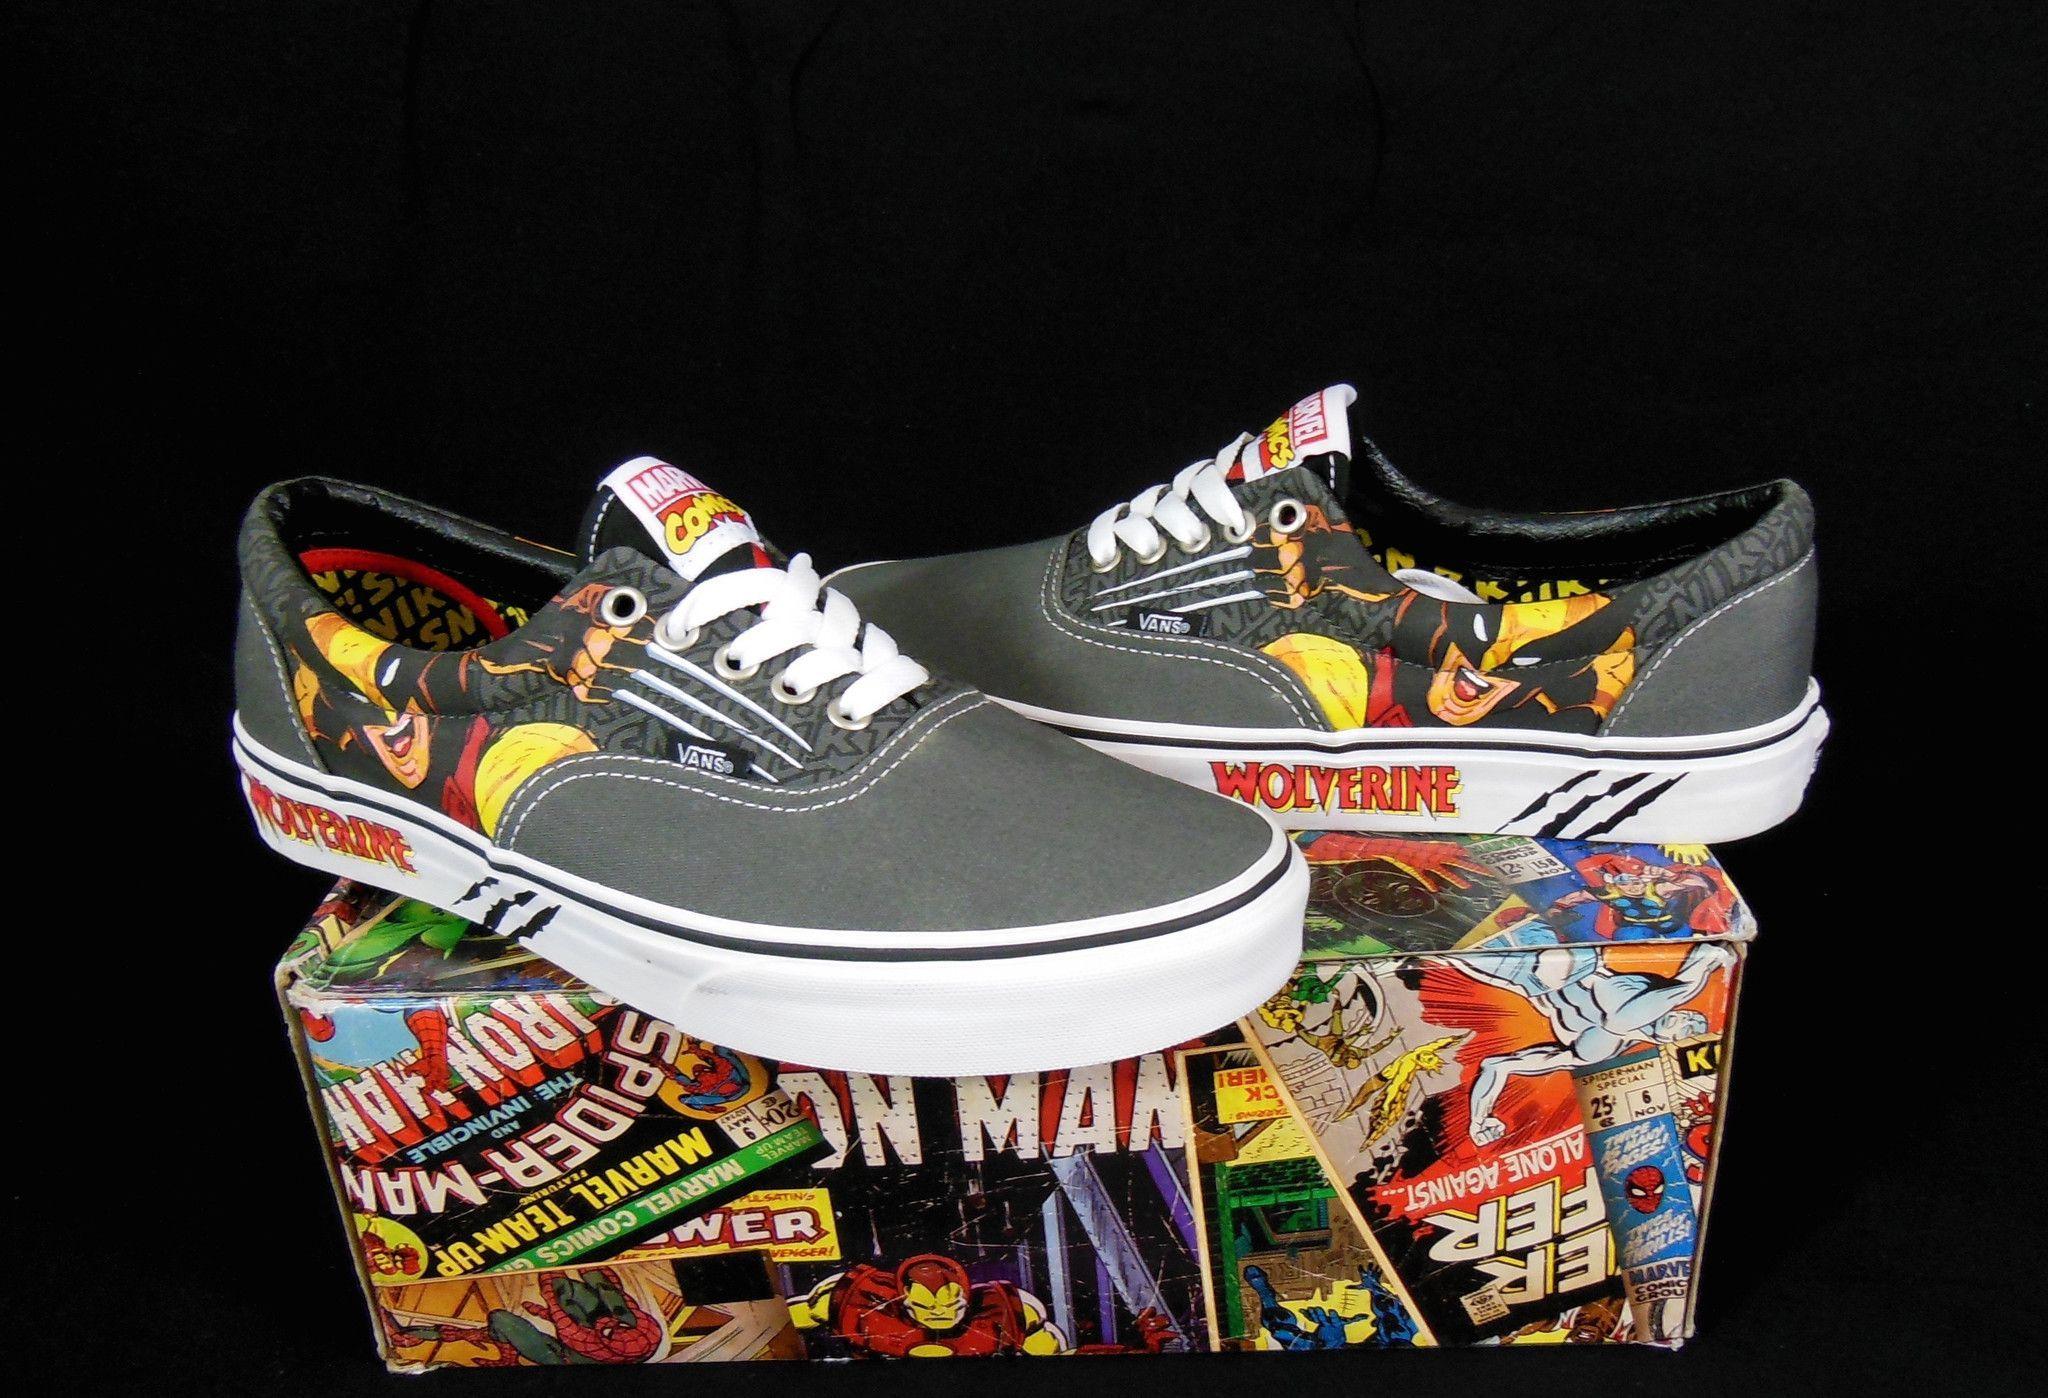 bcb8edf1ce I seriously want these sooooo bad... Like